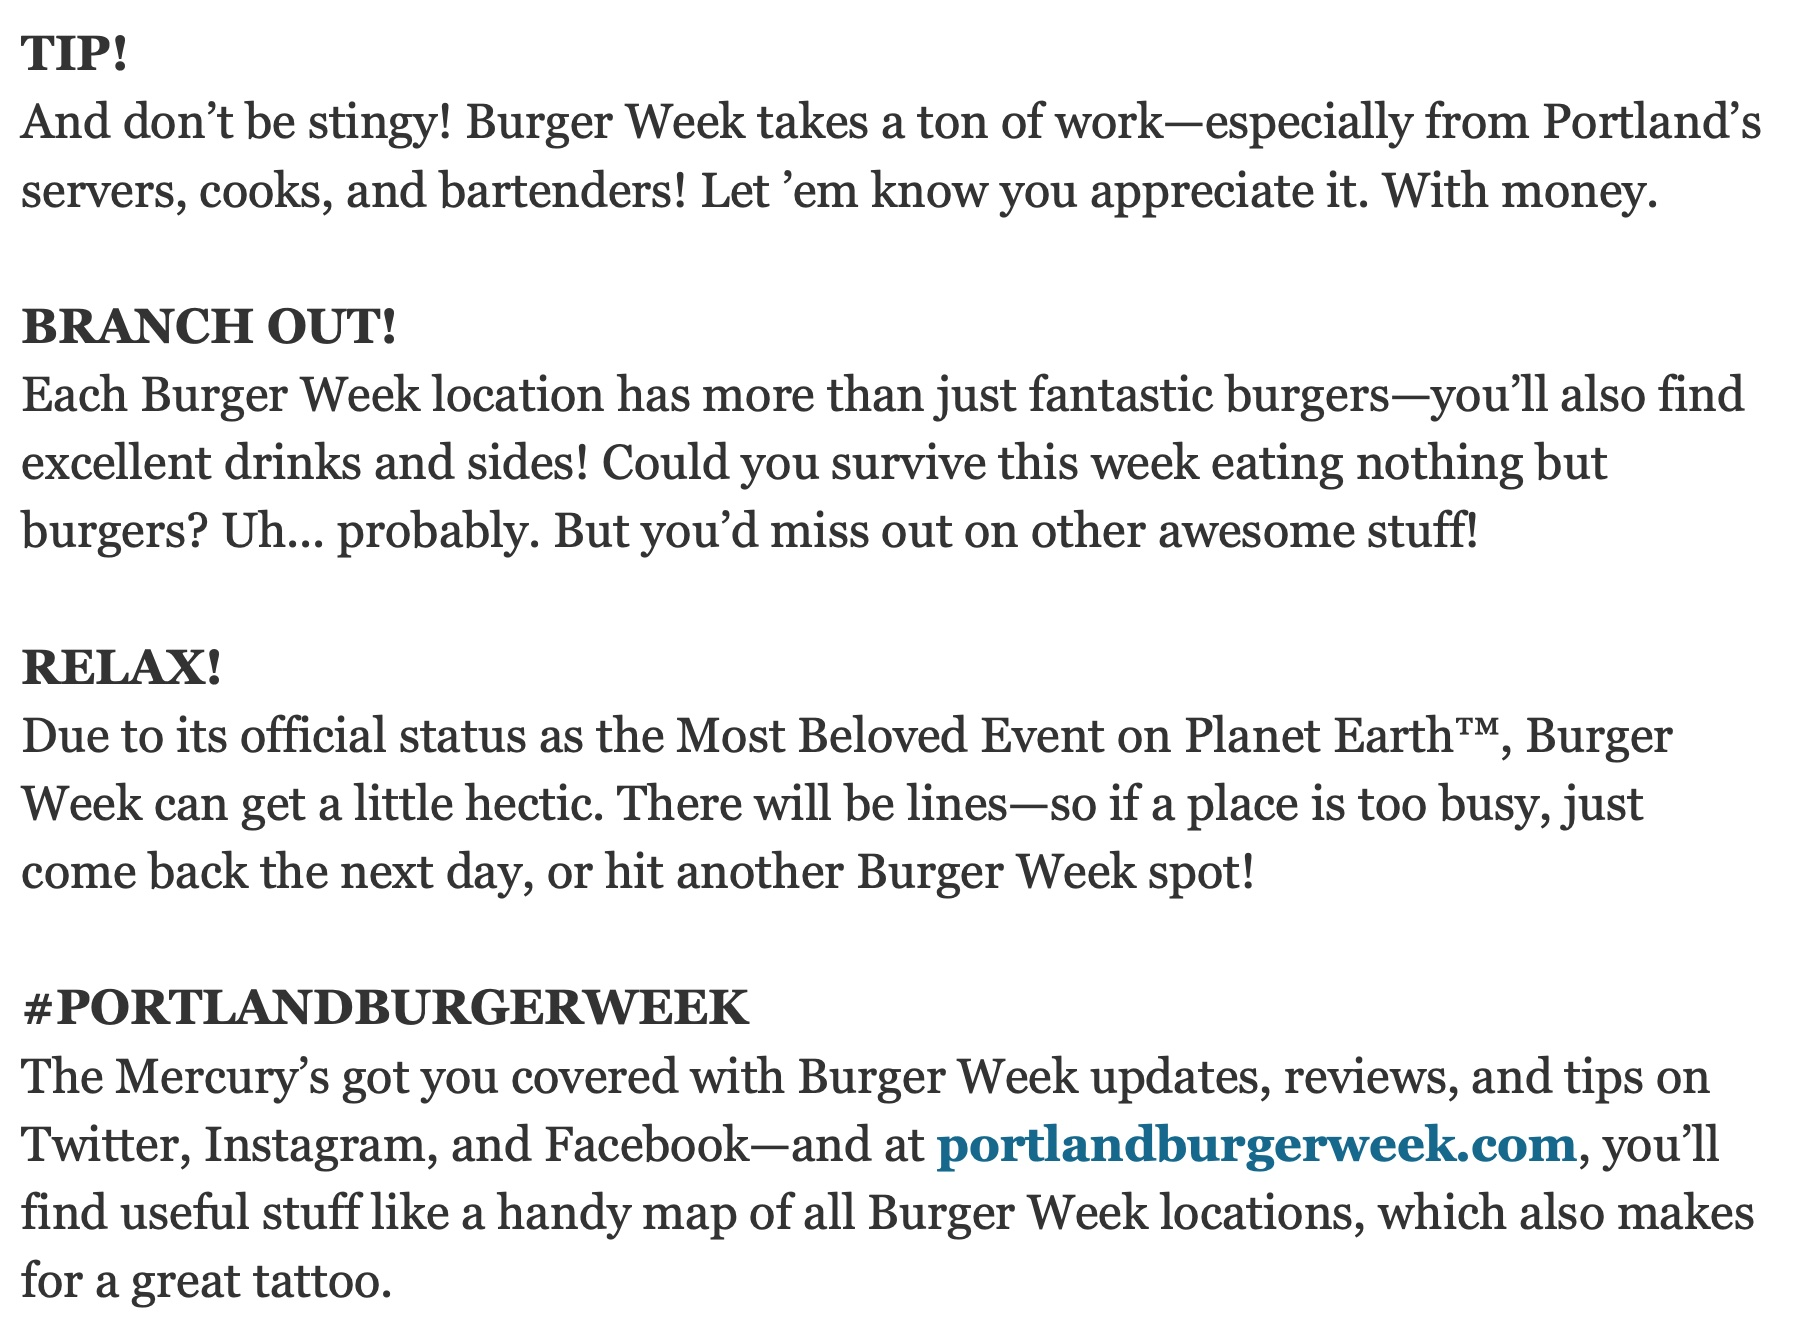 Upbeat ad copy for Portland Burger Week.